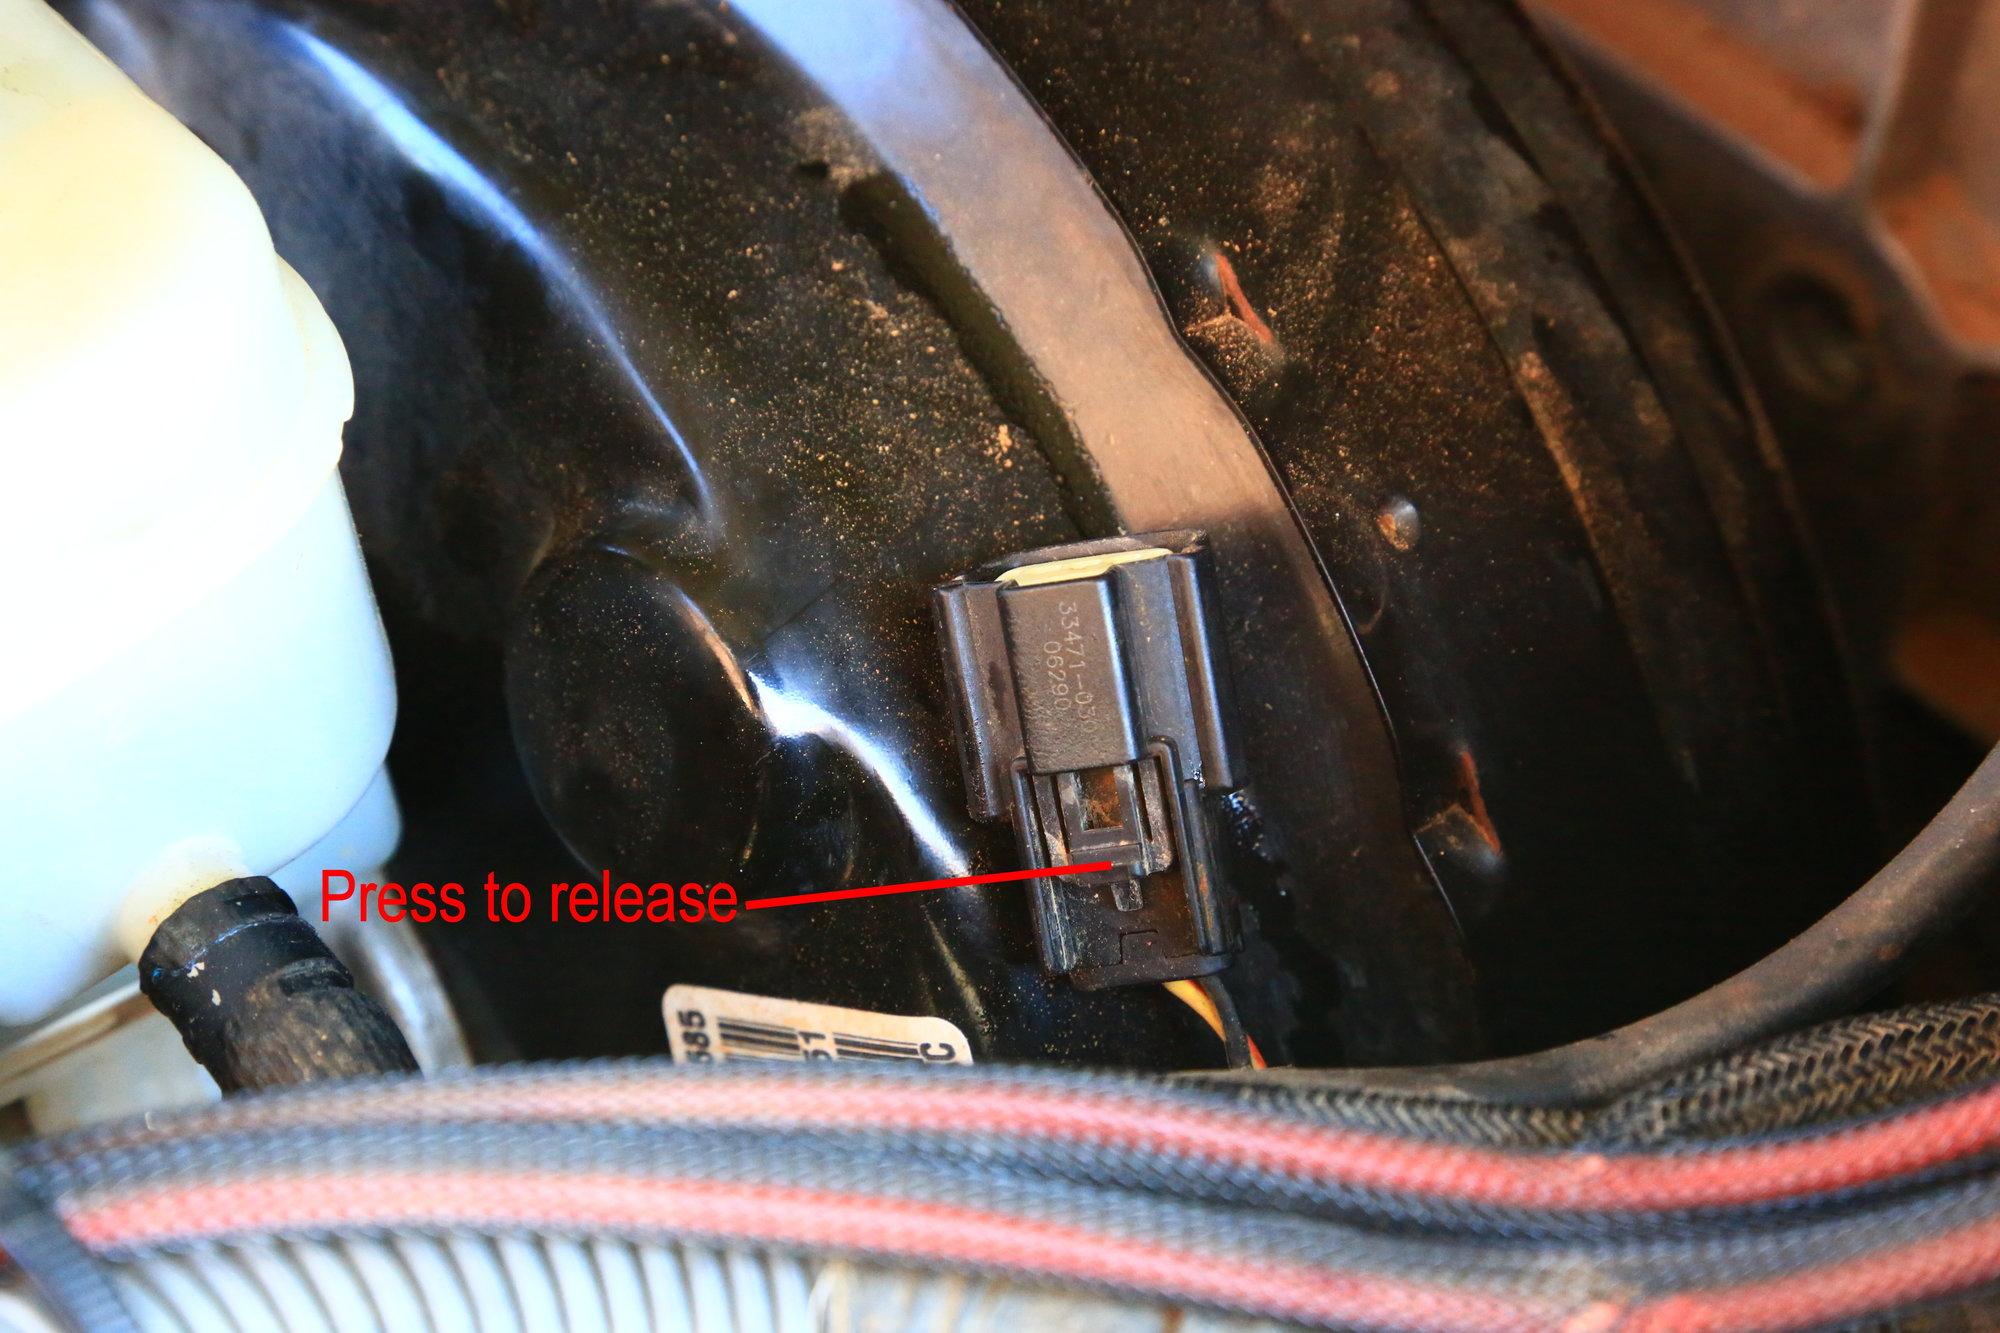 JK Clutch Master Cylinder Replacement Procedure - JK-Forum